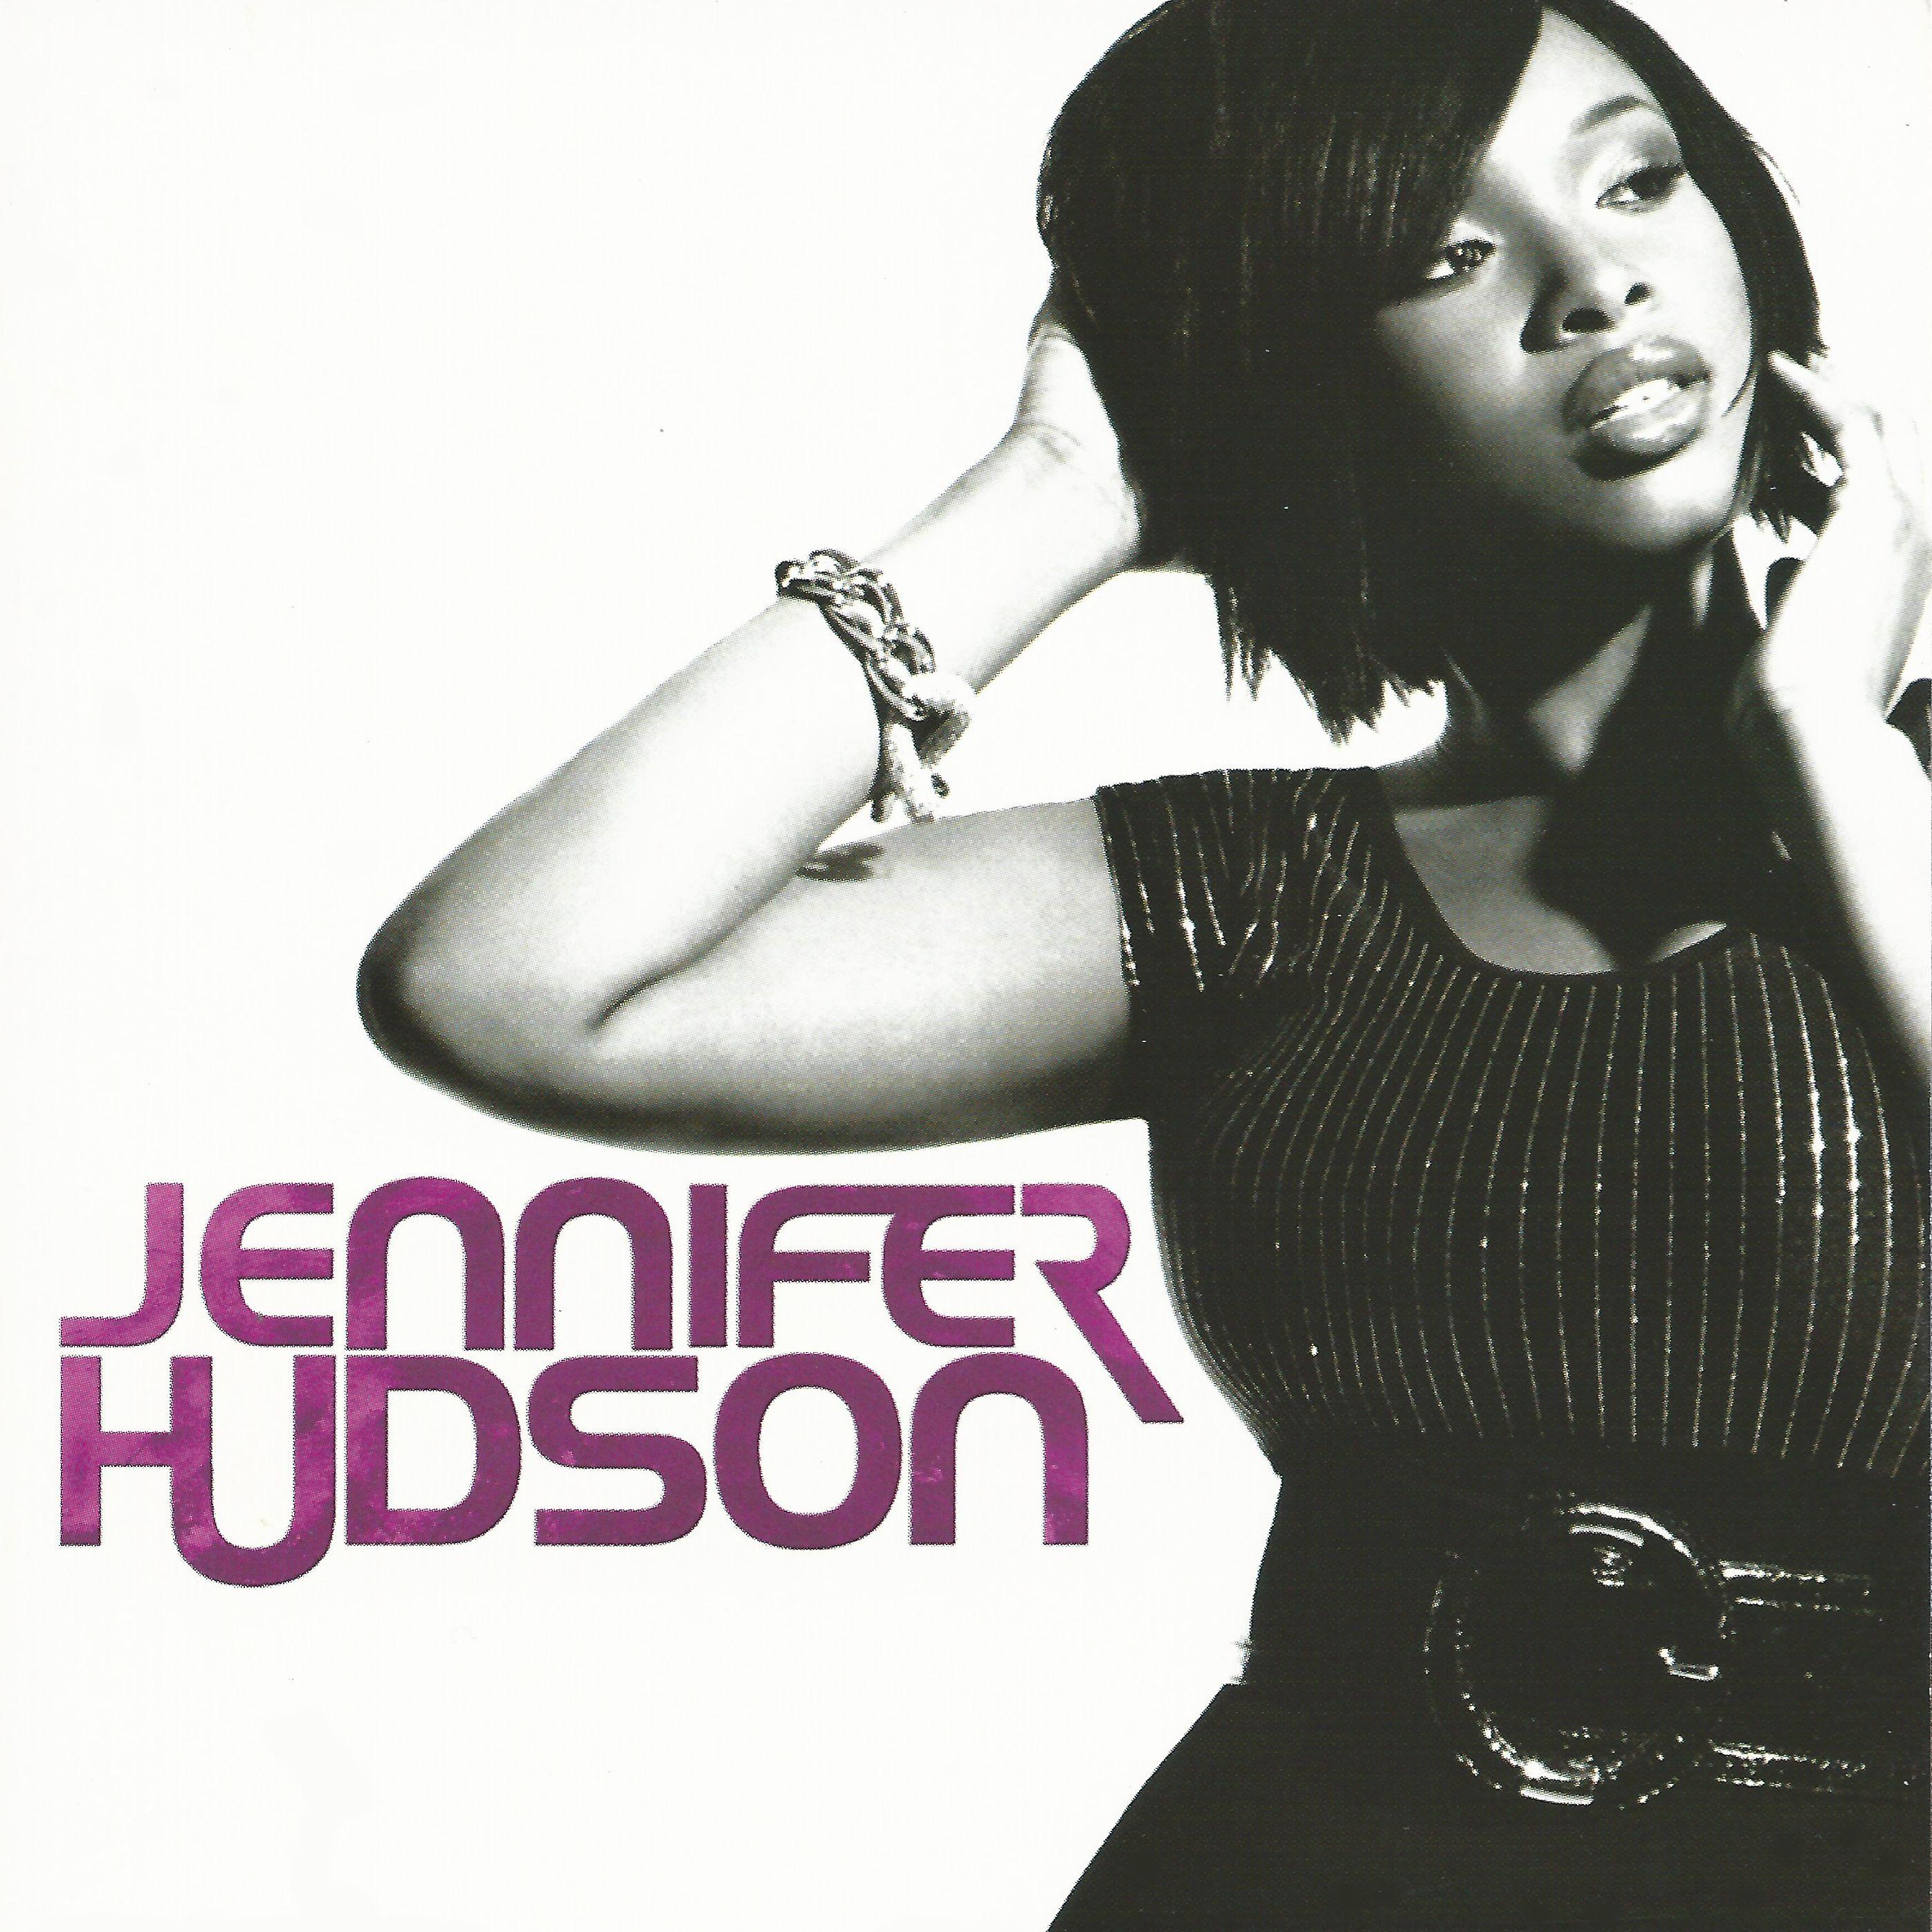 Jennifer Hudson - Jennifer Hudson album cover